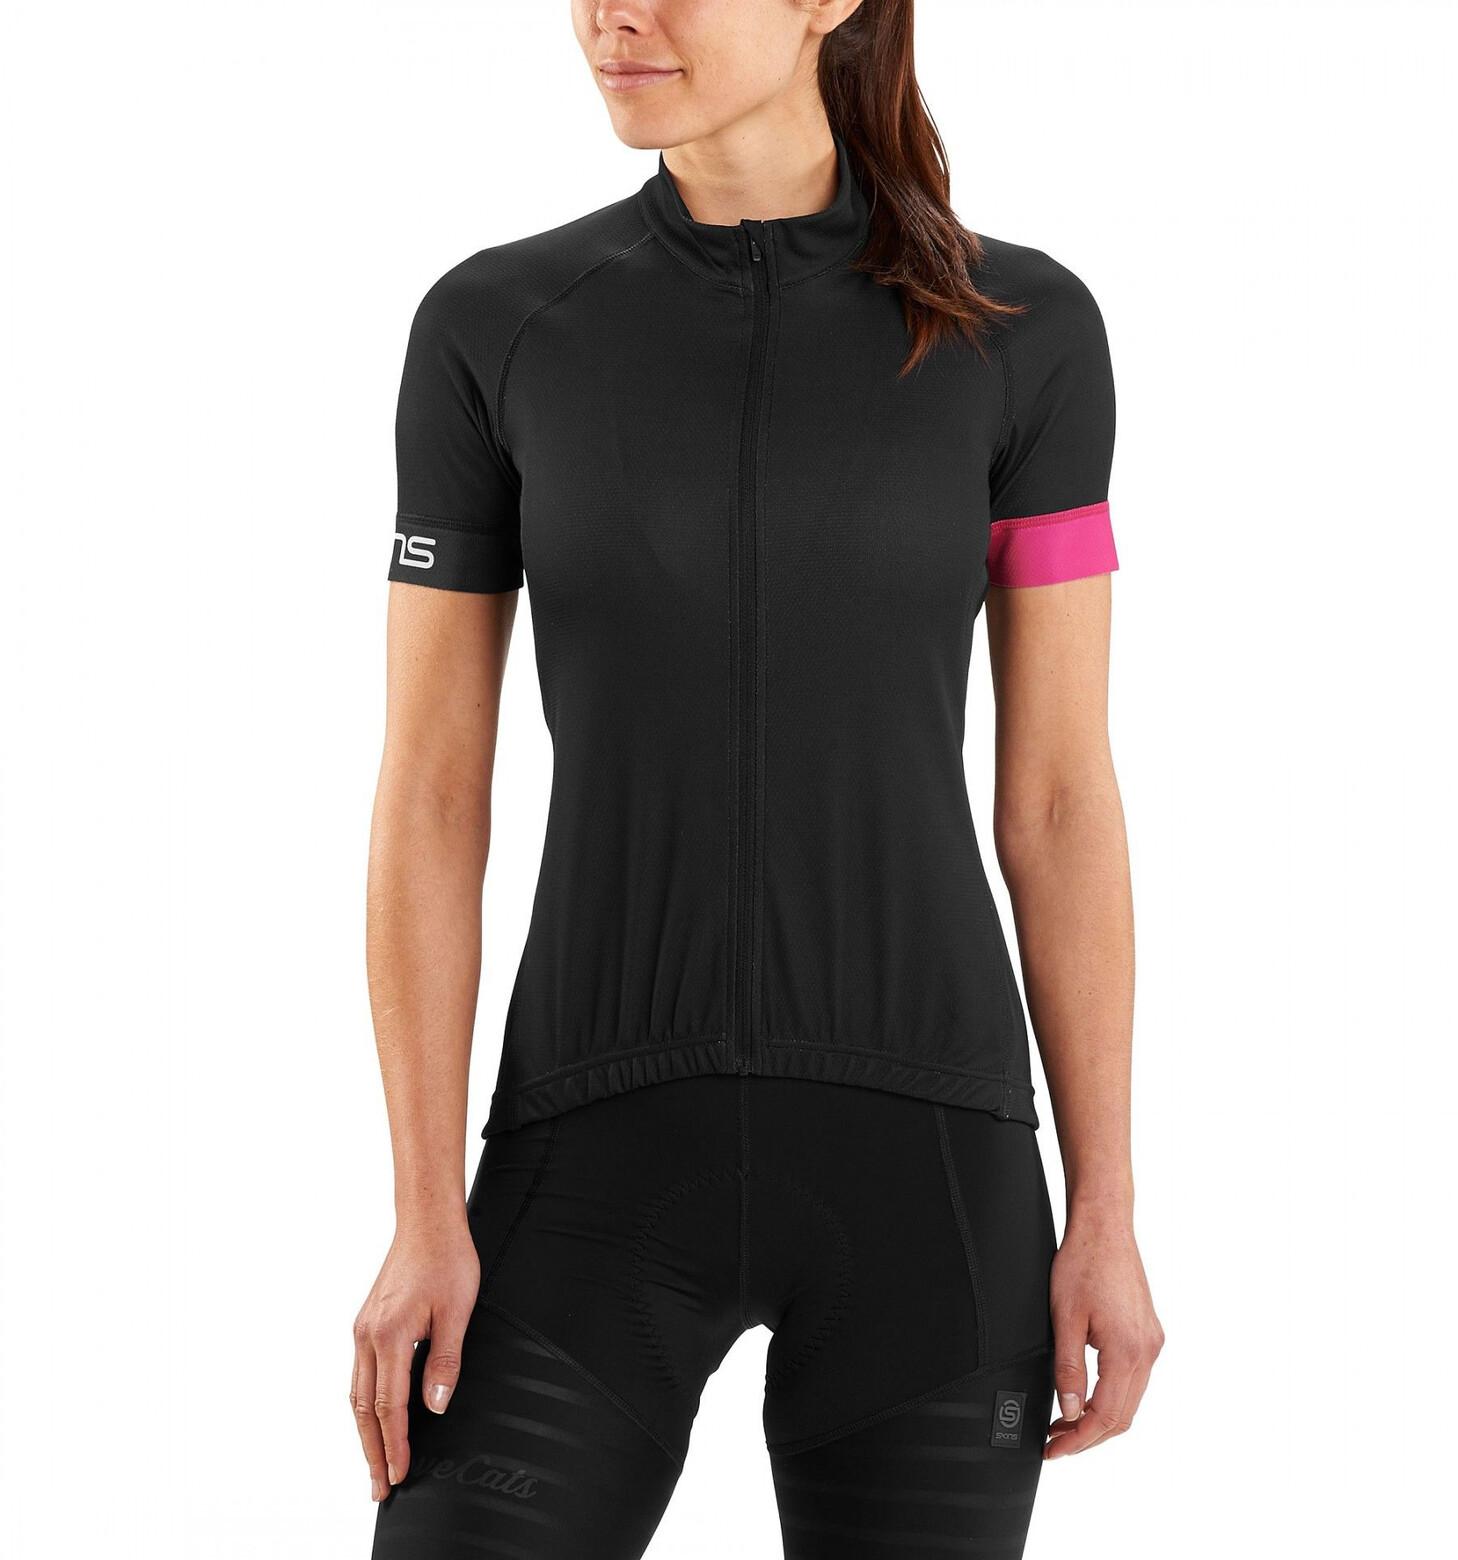 Skins Cycle Classic Kortærmet cykeltrøje Damer, black/magenta | Jerseys